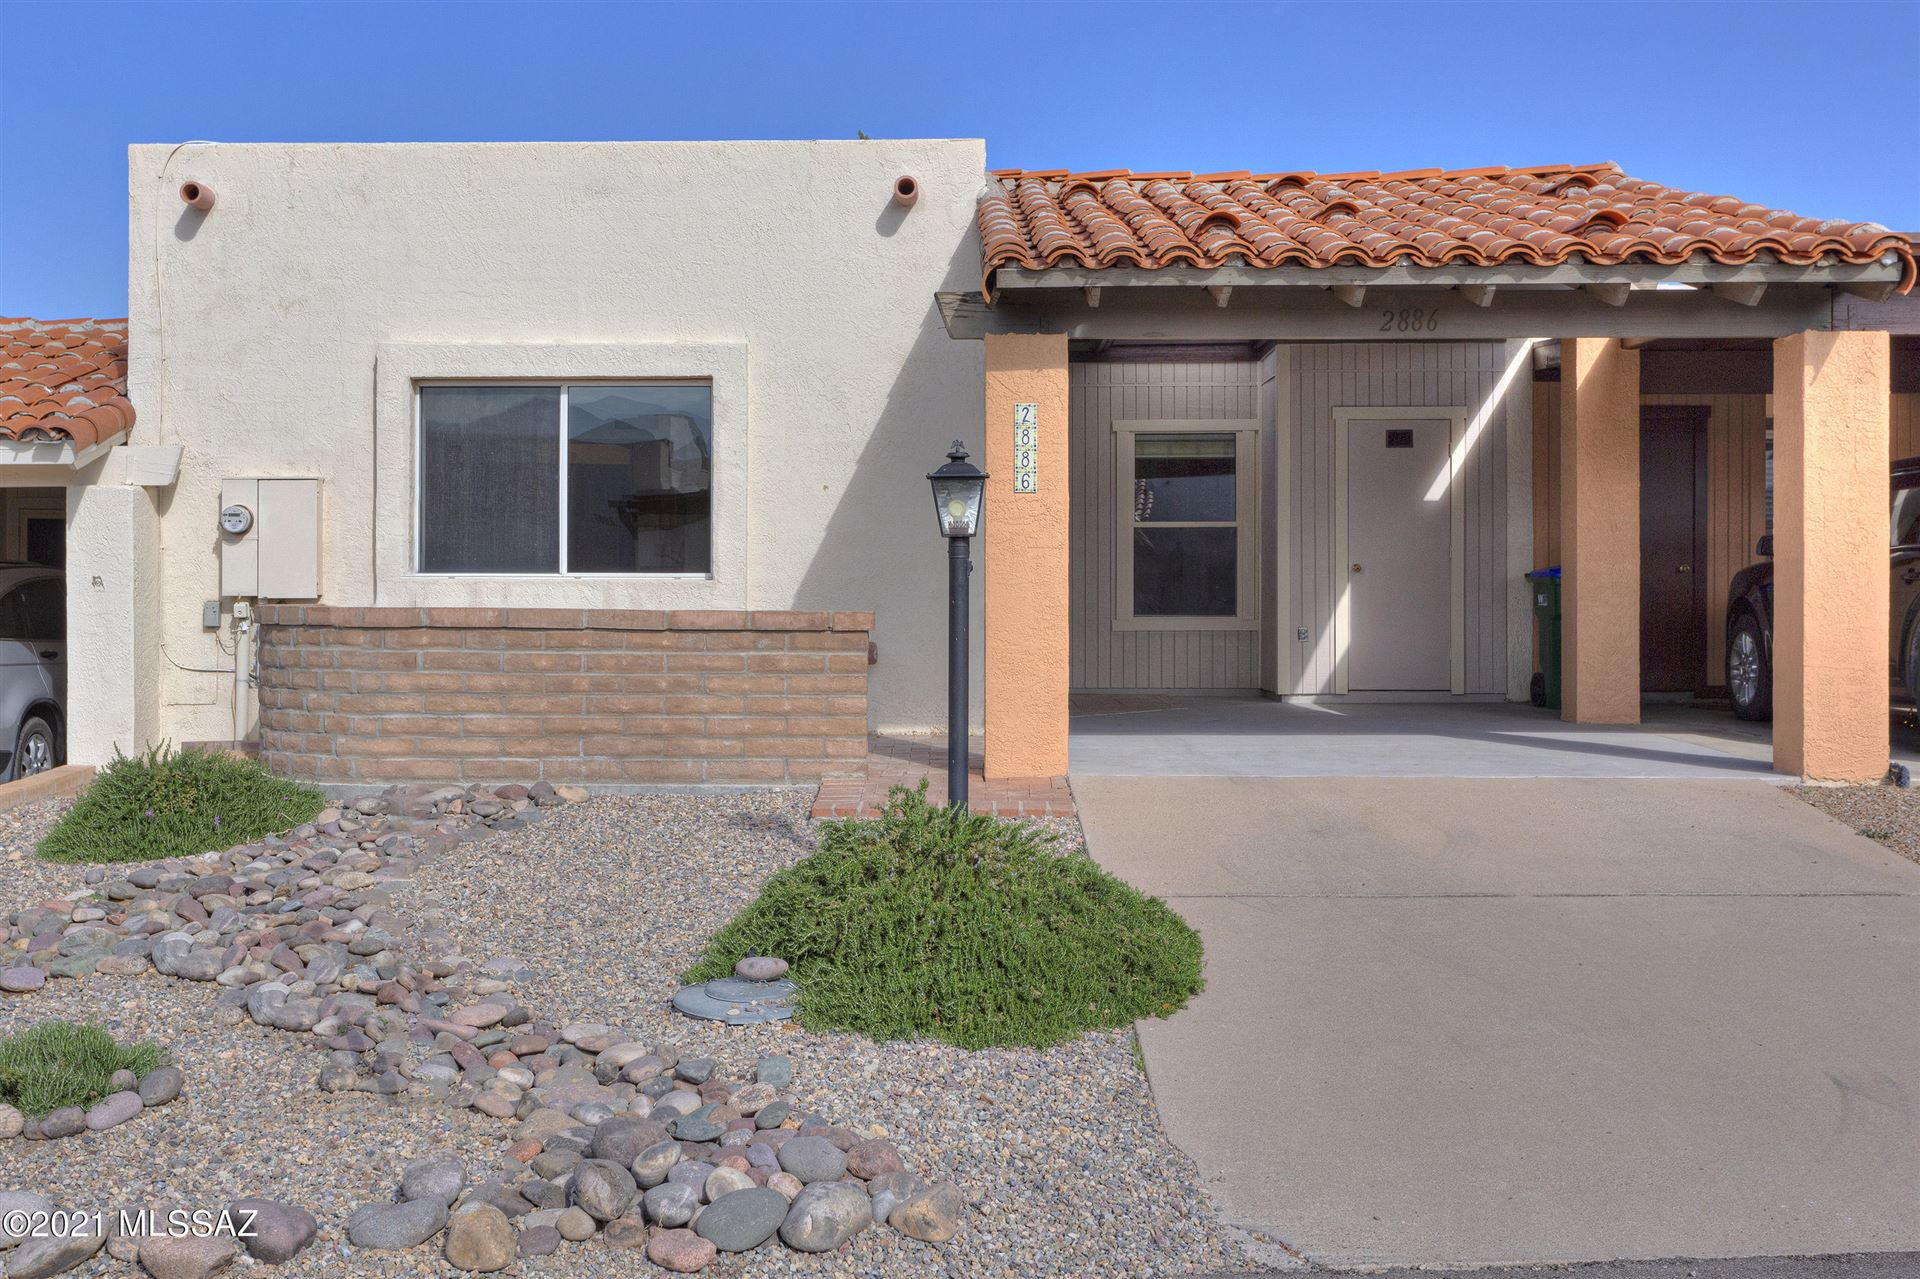 2886 S Camino Pansa, Green Valley, AZ 85622 - MLS#: 22108162